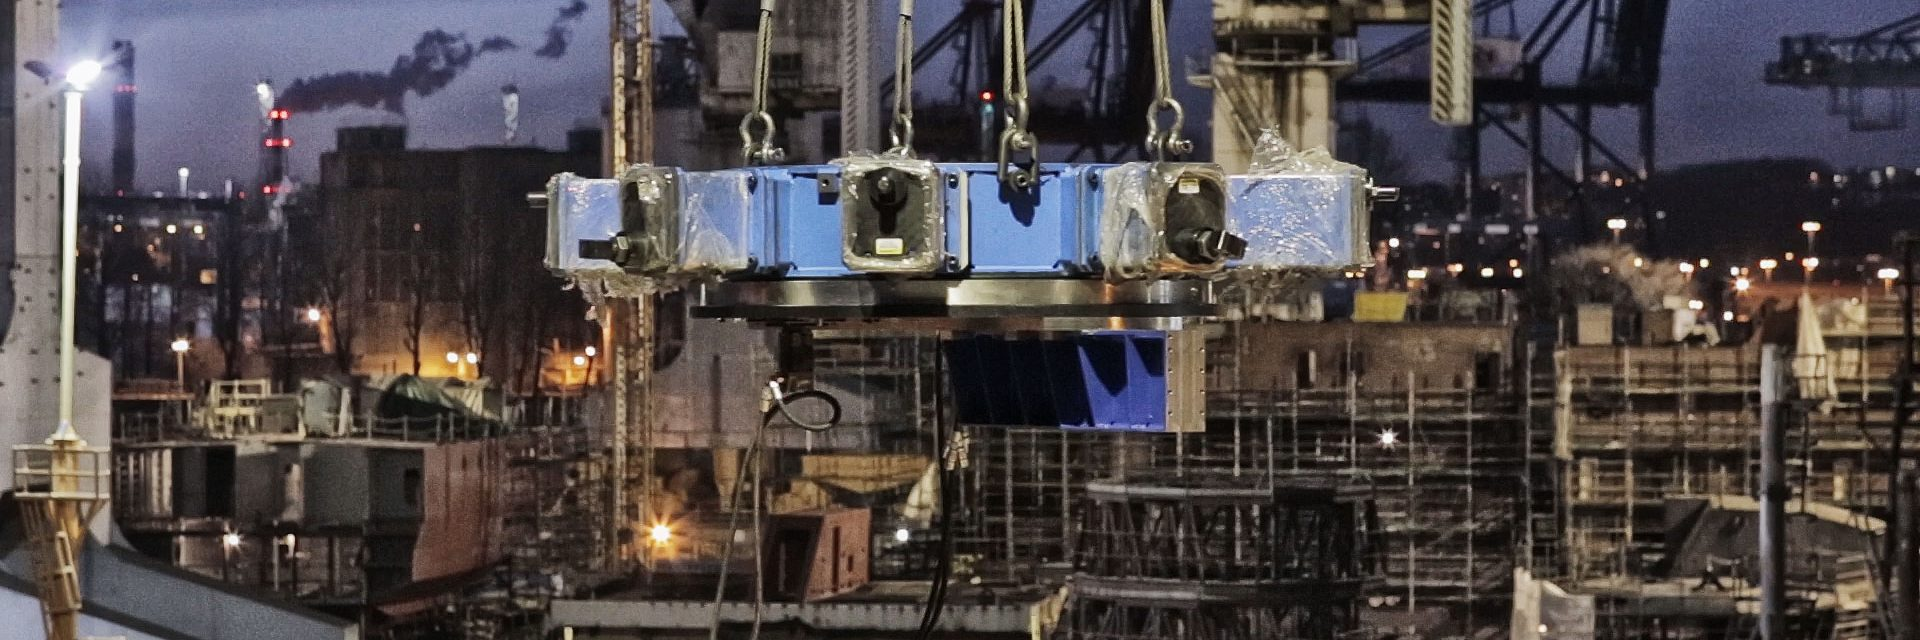 On site machining